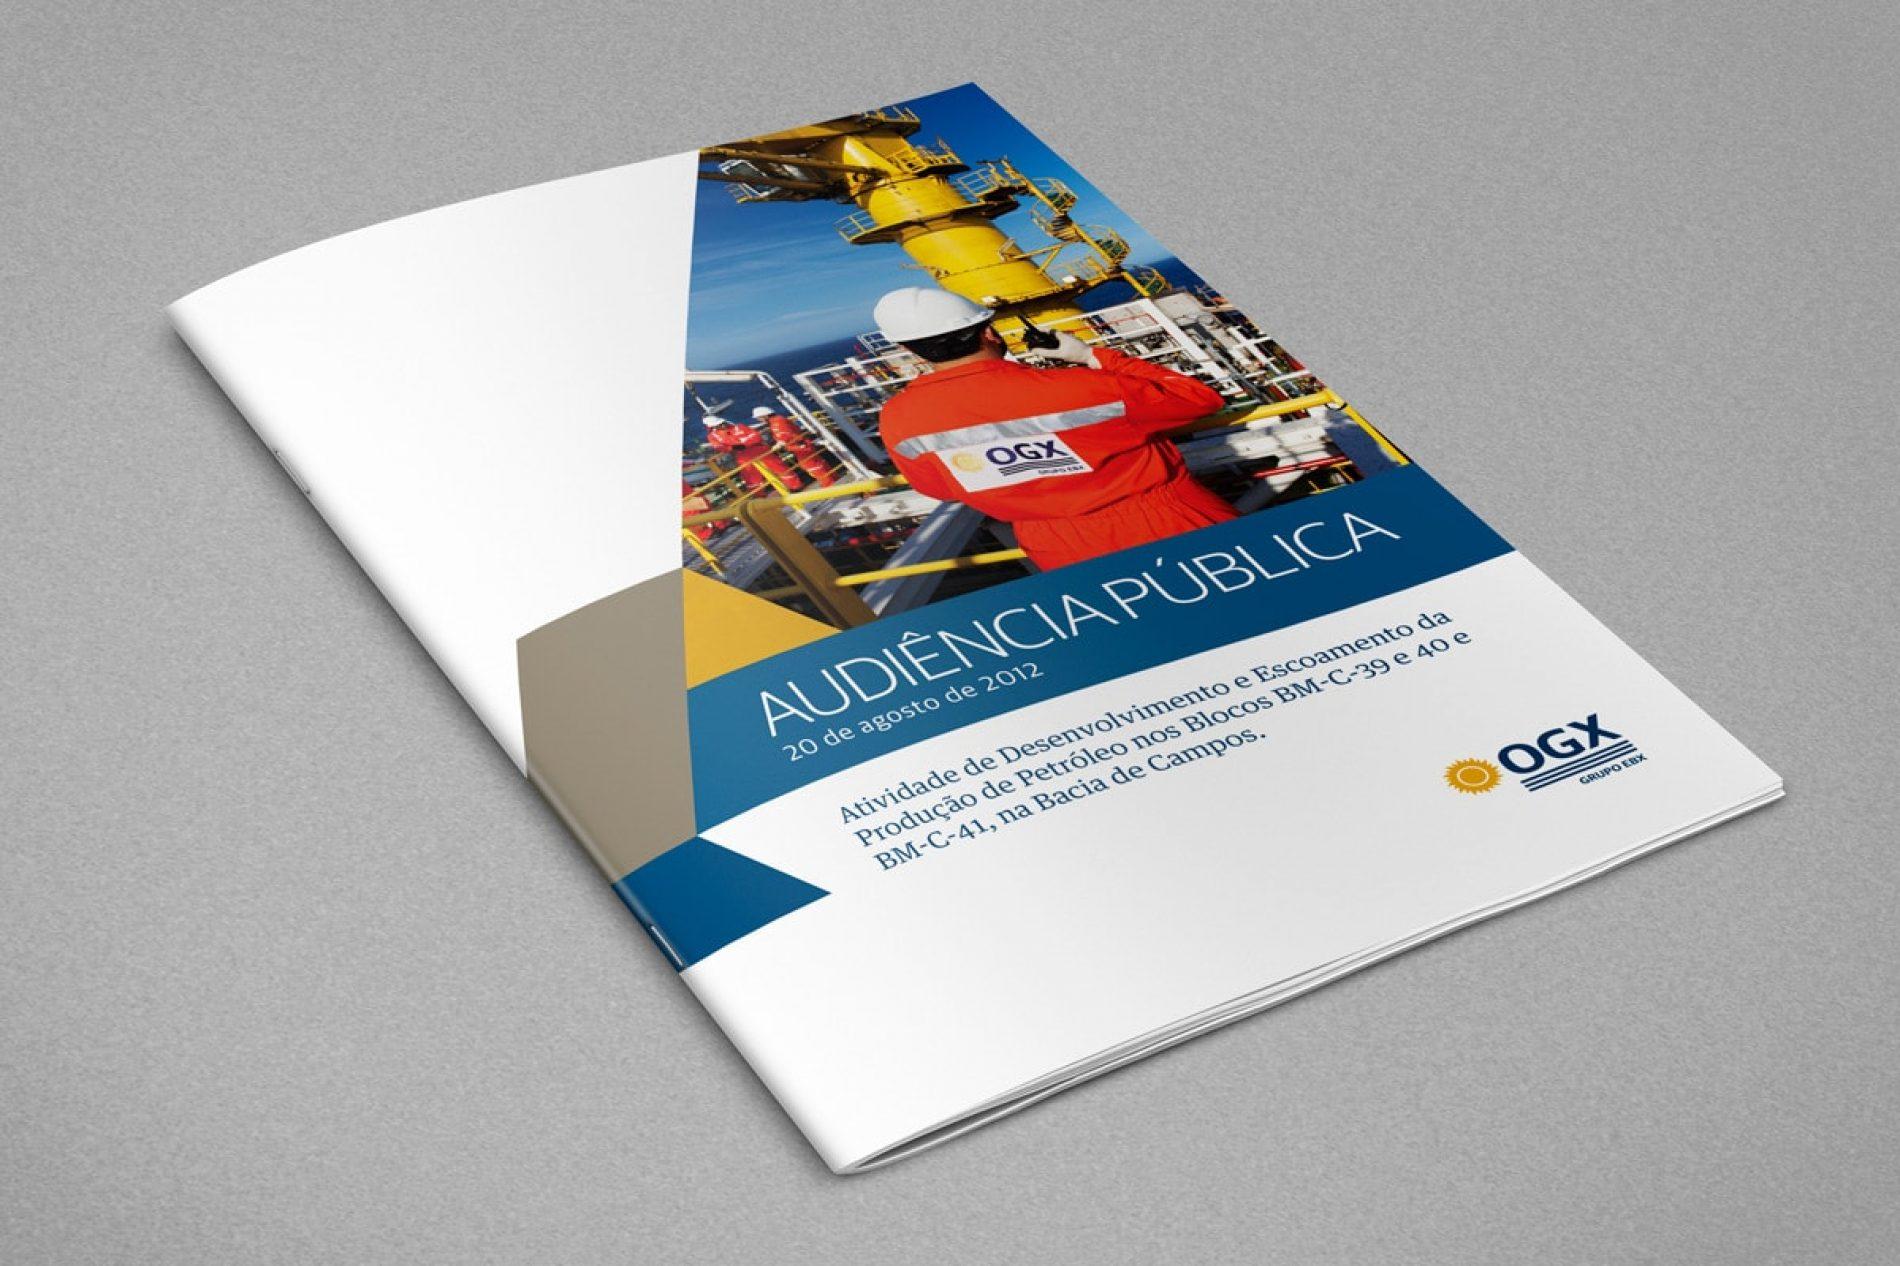 Brochura Audiência Pública OGX